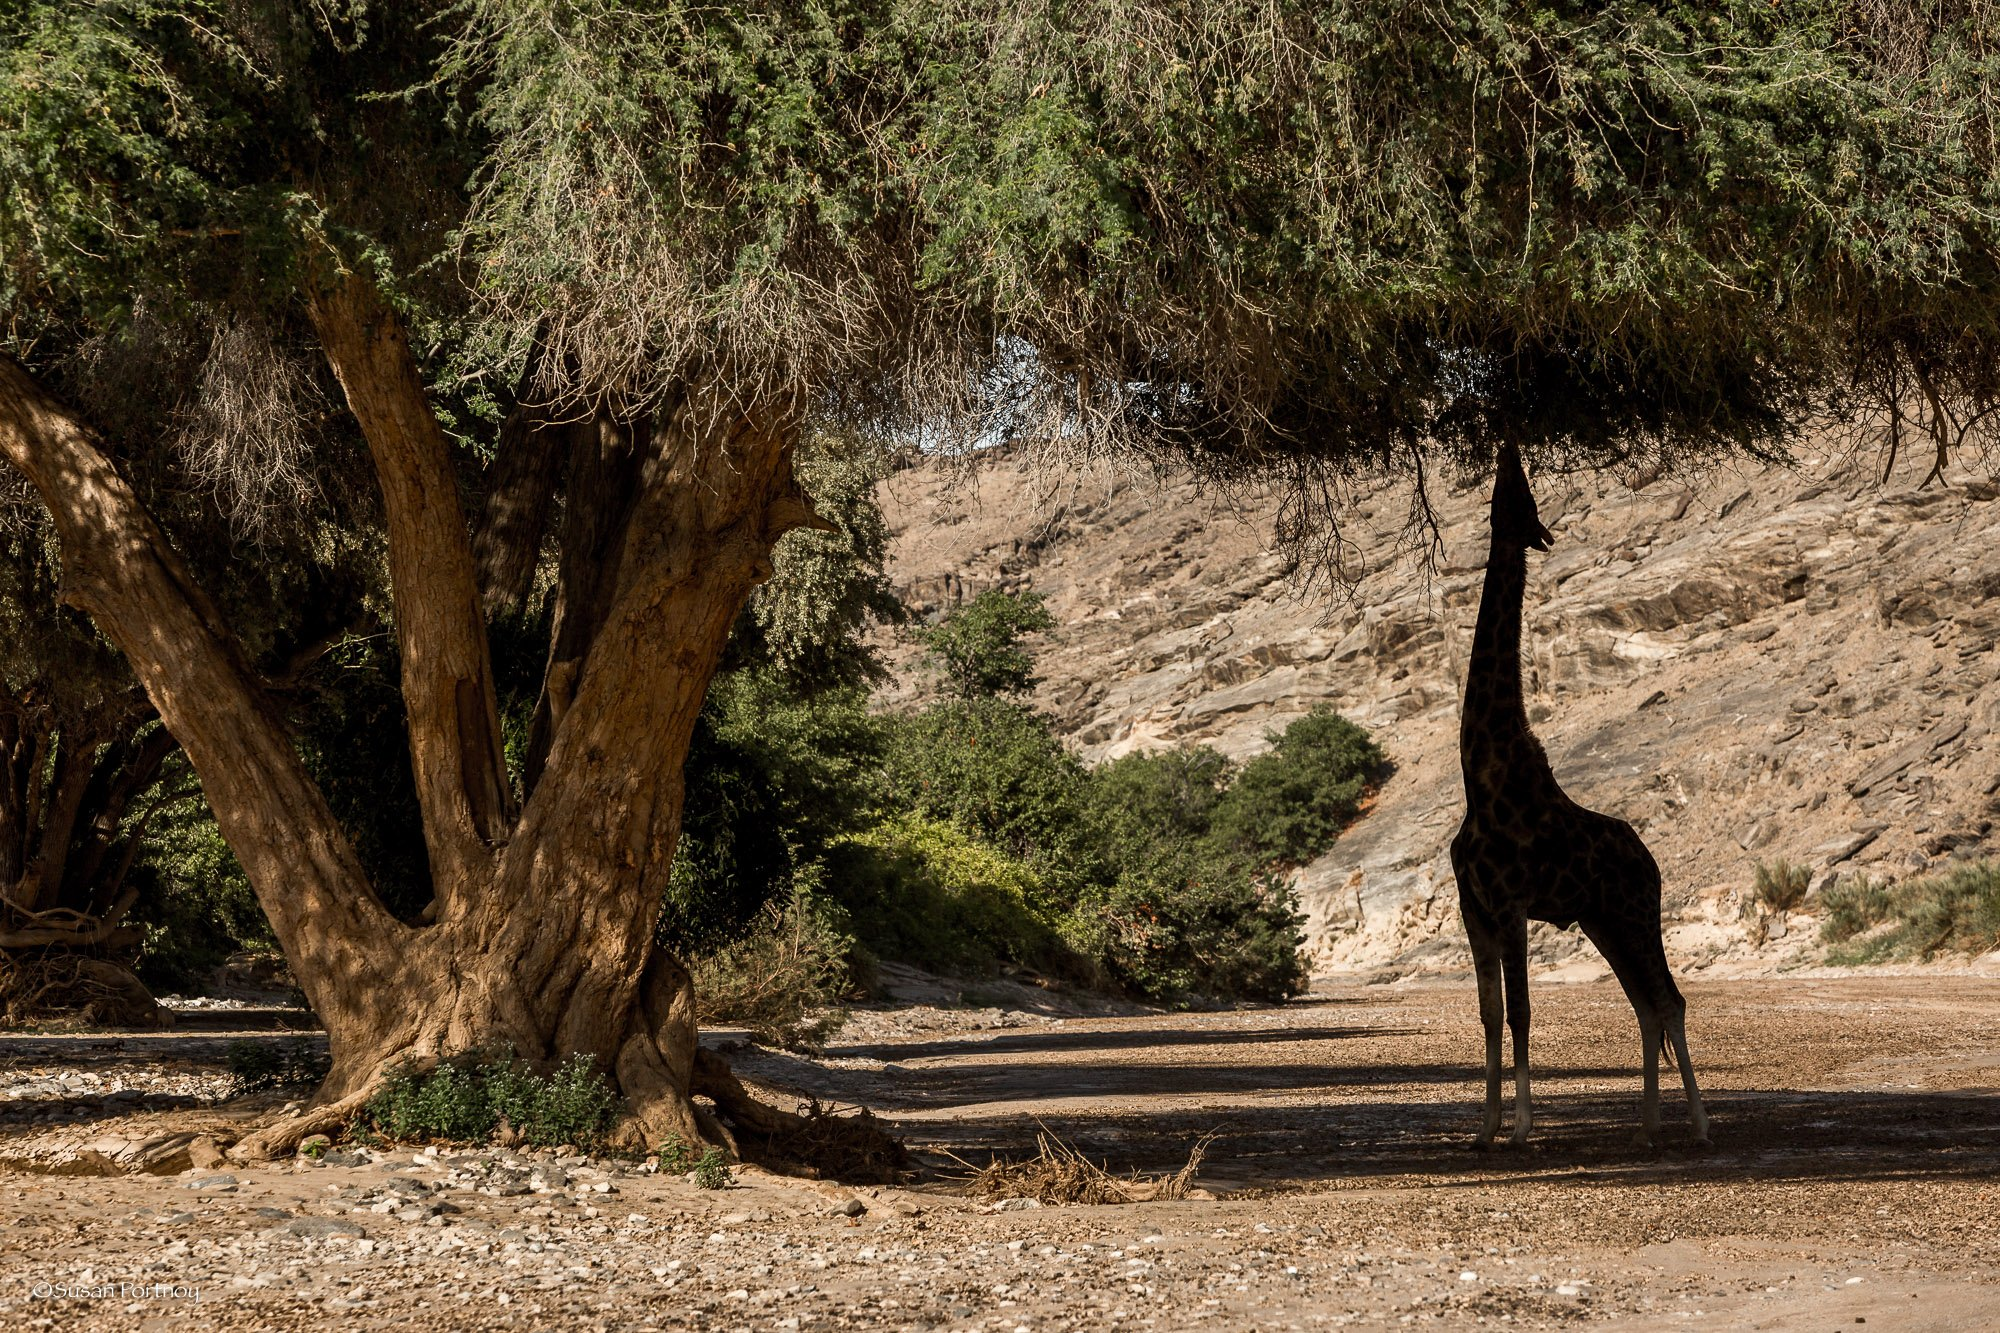 giraffe eats leaves under a tree near Skeleton Coast Camp in Namibia